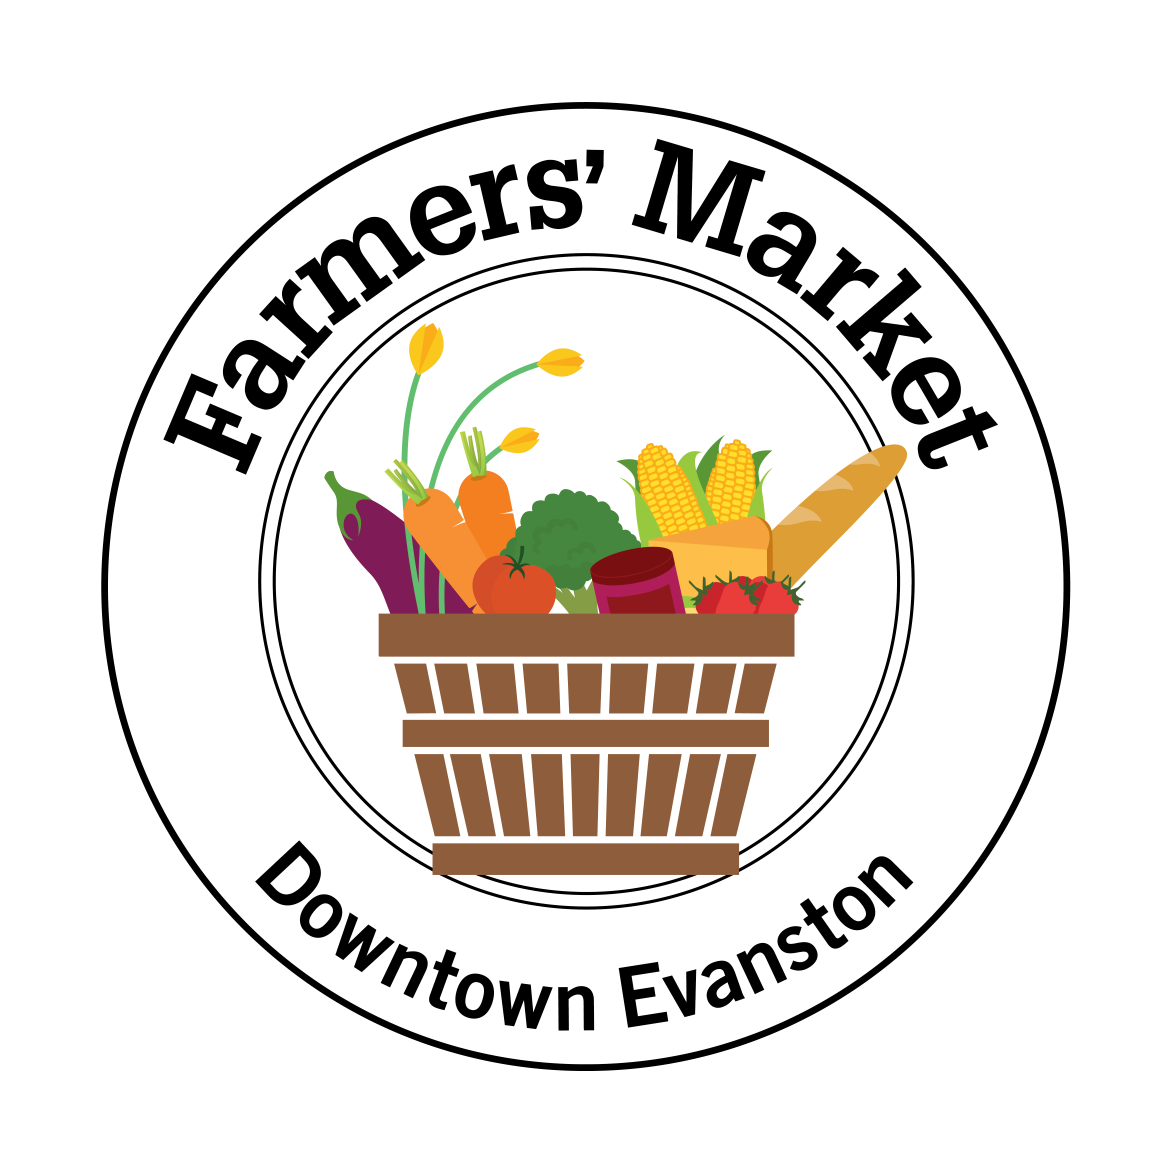 downtown_Evanston_farmers_market.png